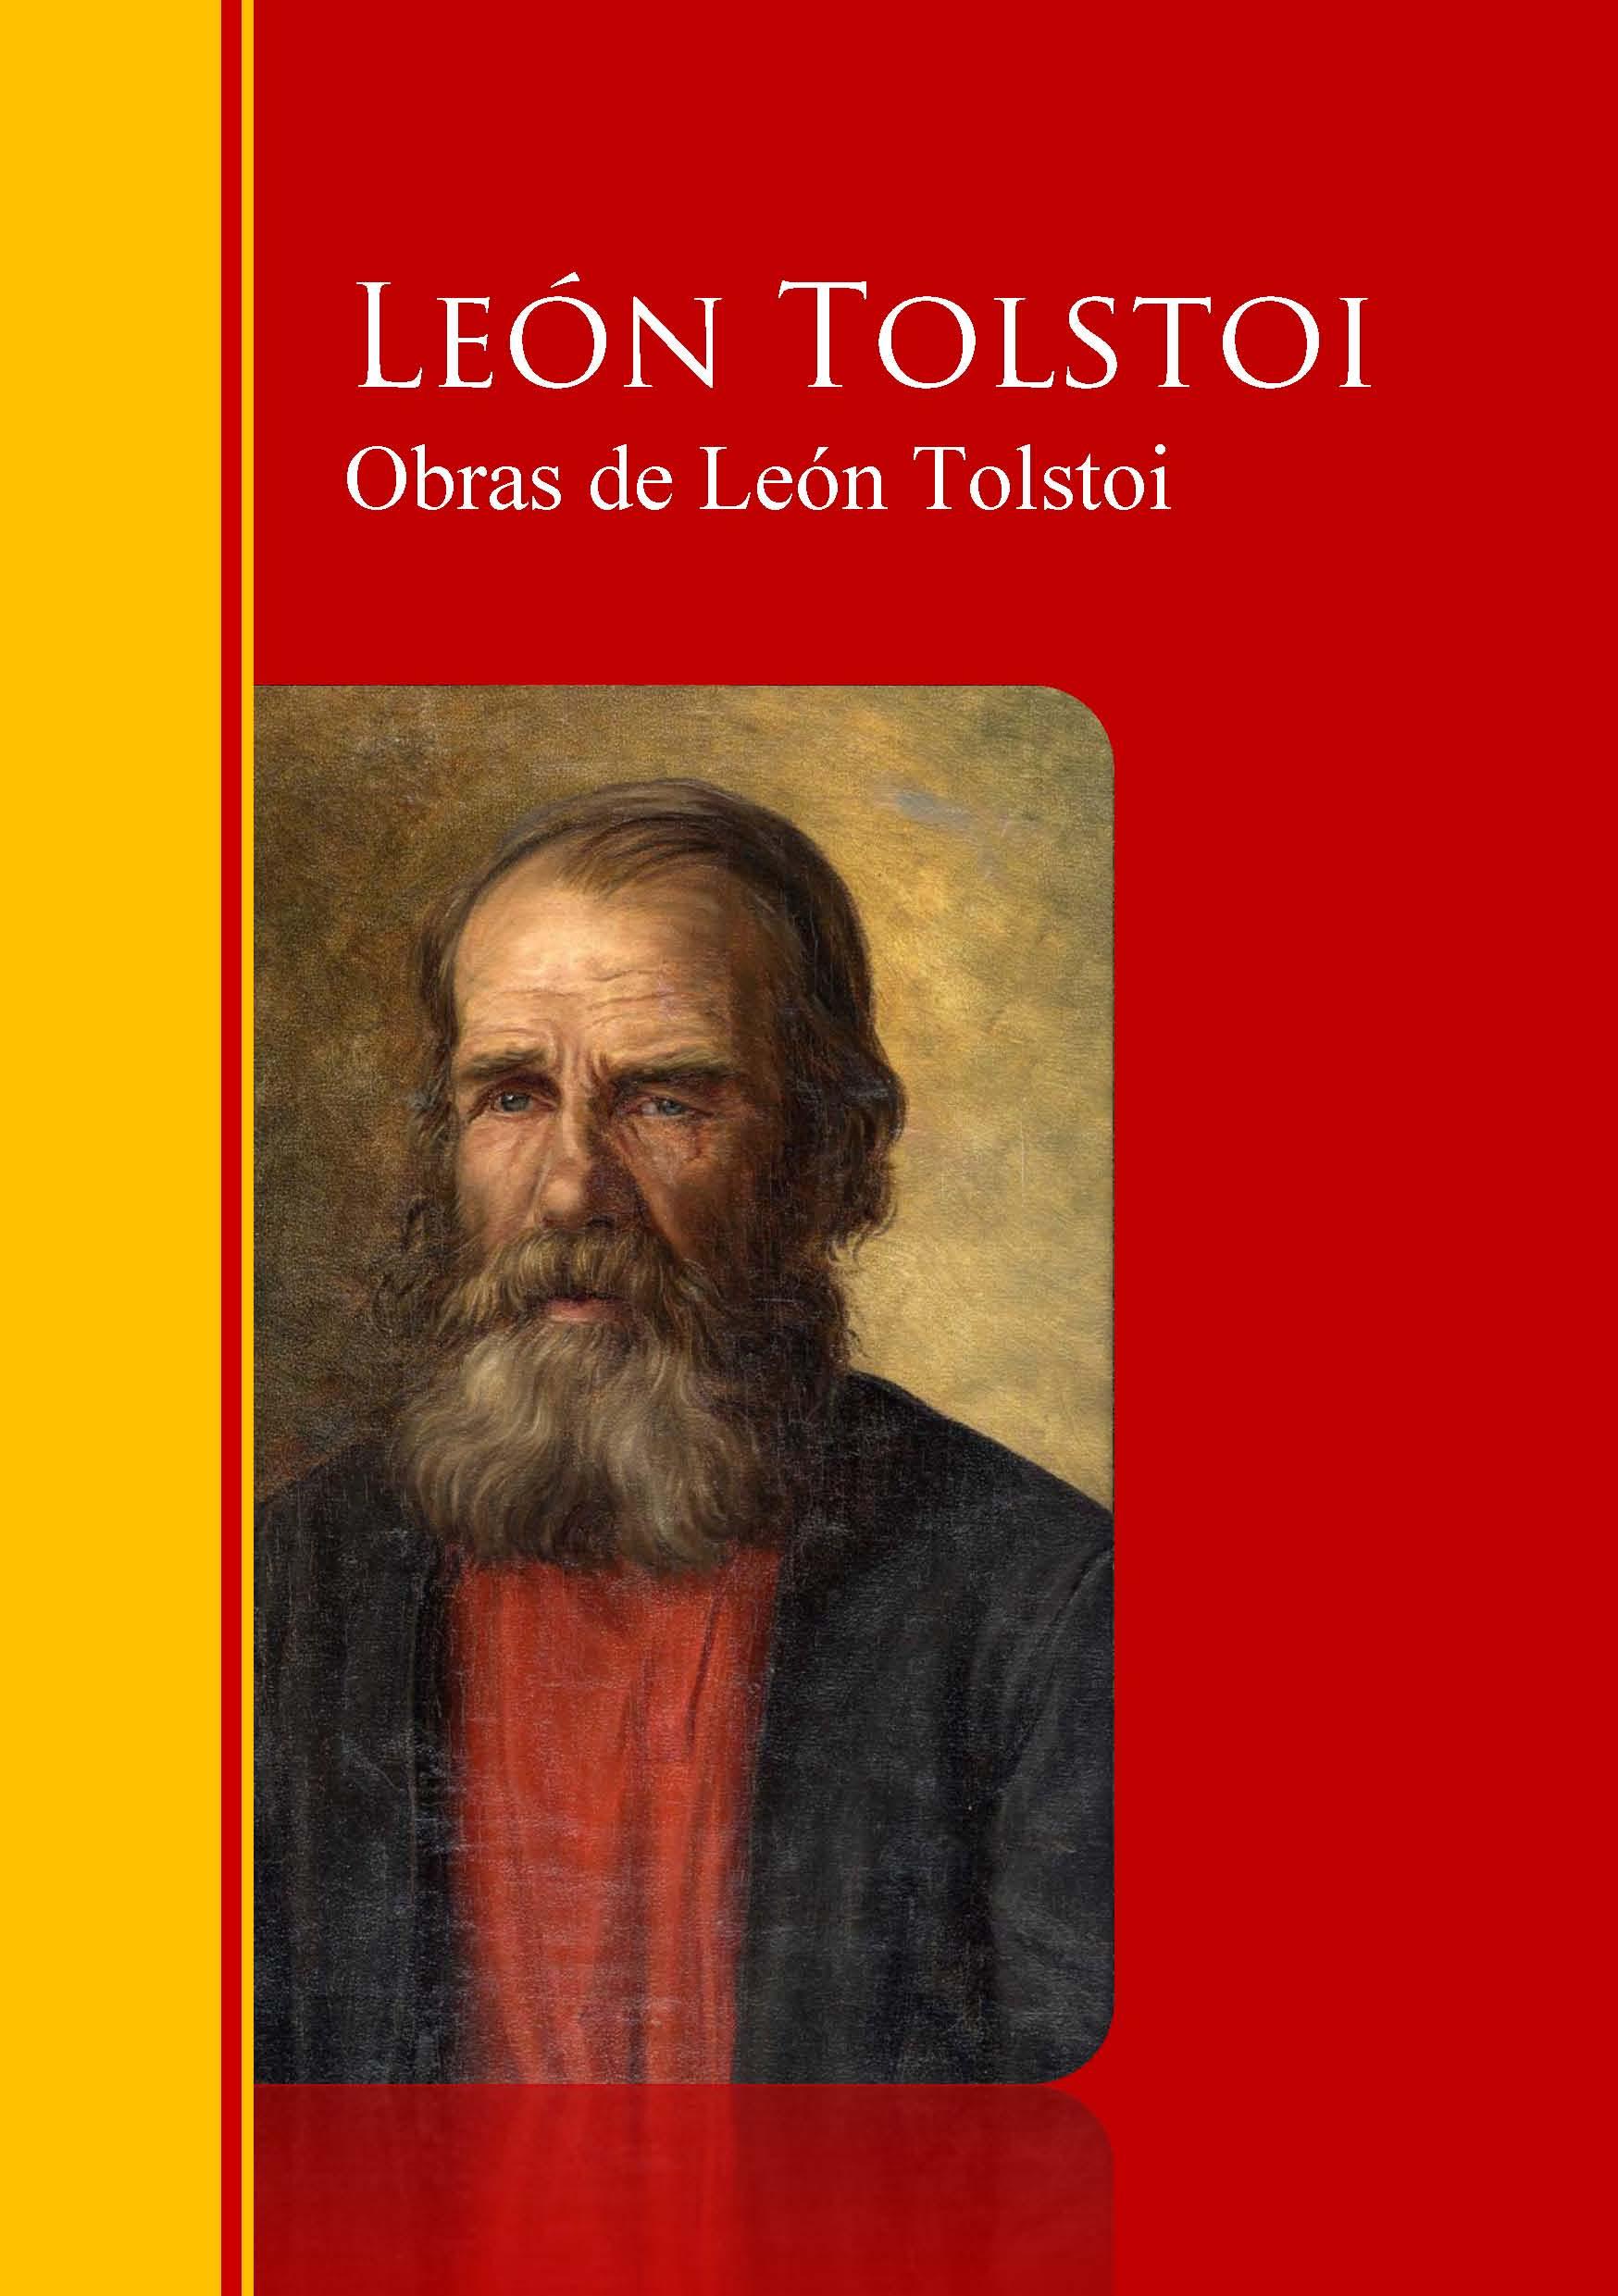 Leon Tolstoi Obras Completas - Coleccion de León Tolstoi лев толстой tolstoi for the young select tales from tolstoi